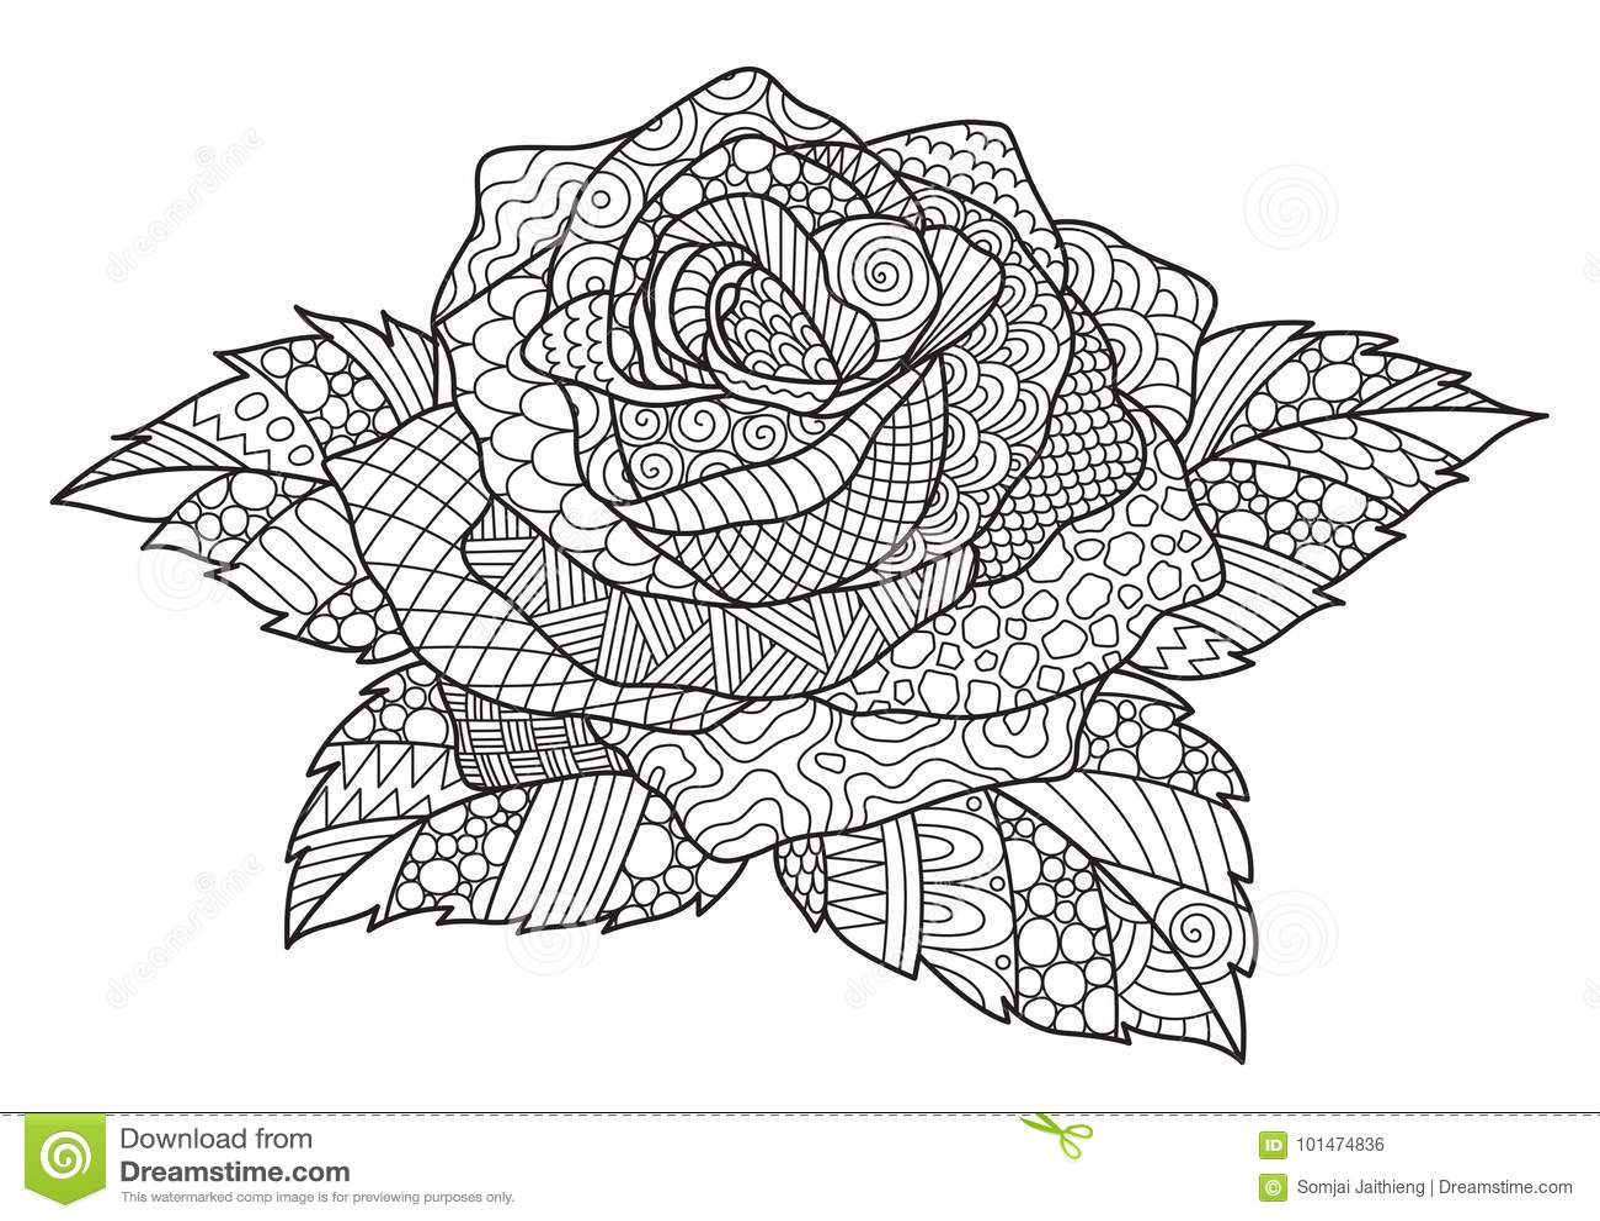 Zendoodle Design Of Rose For Design Element And Adult